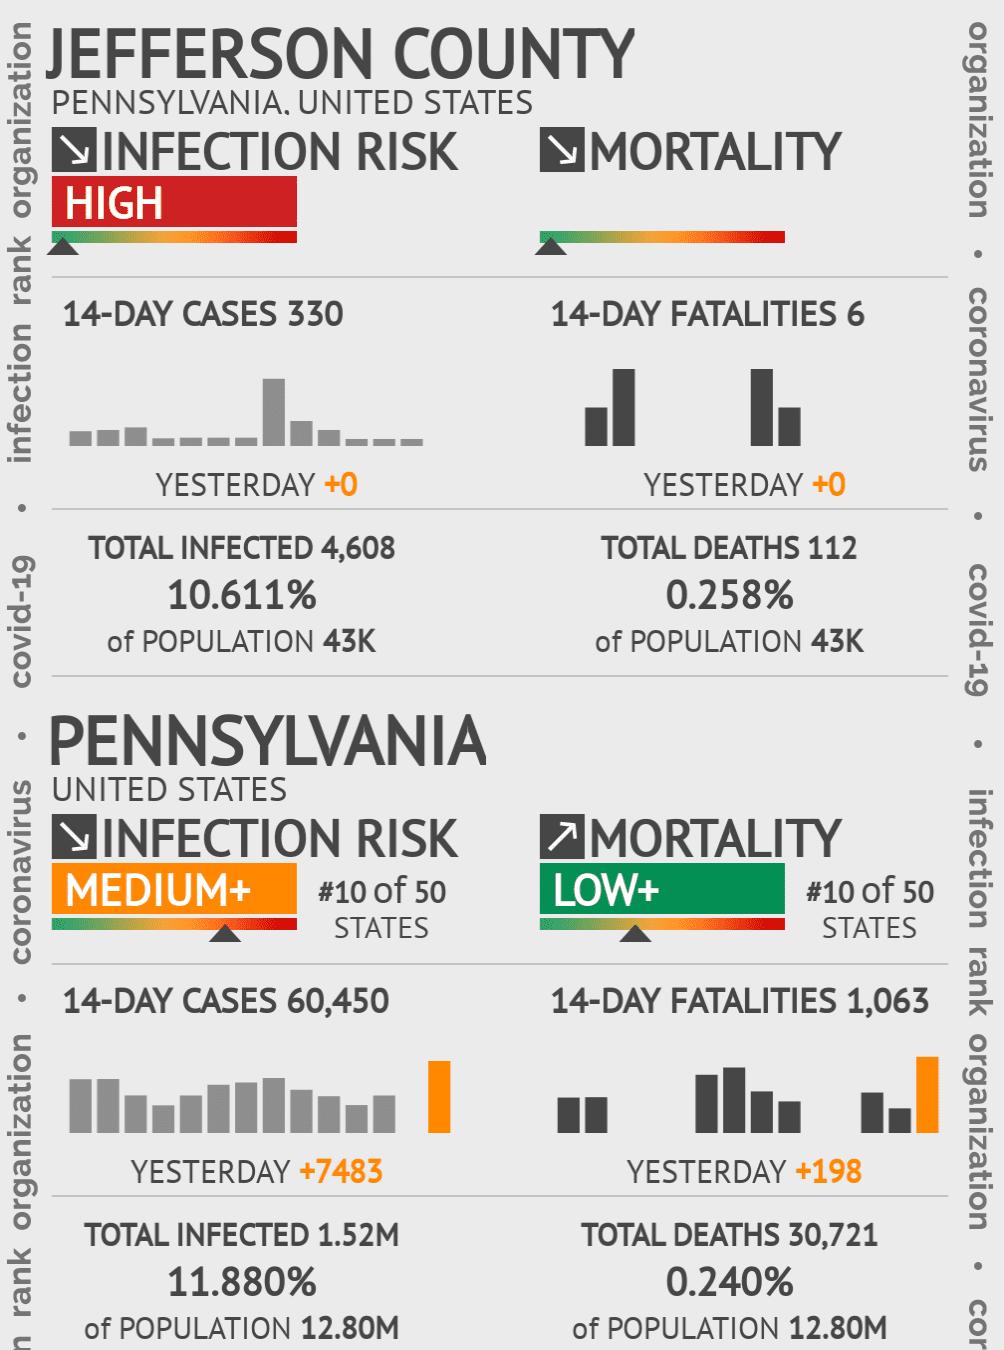 Jefferson County Coronavirus Covid-19 Risk of Infection on October 28, 2020